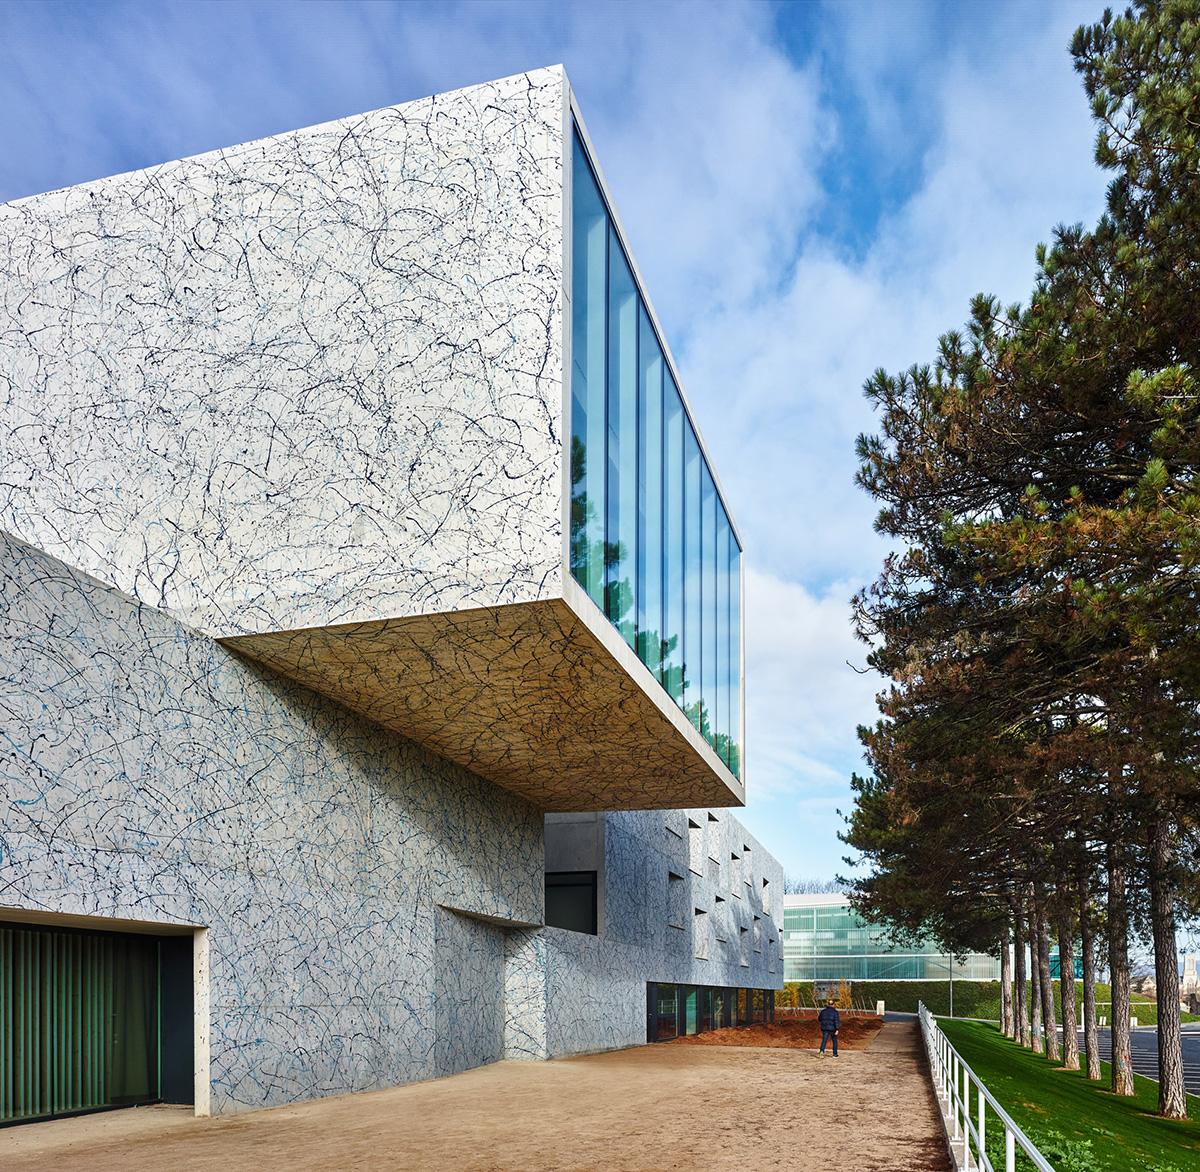 02-conservatorio-musica-danza-artes-dramaticas-henri-dutilleux-dominique-coulon-architecte